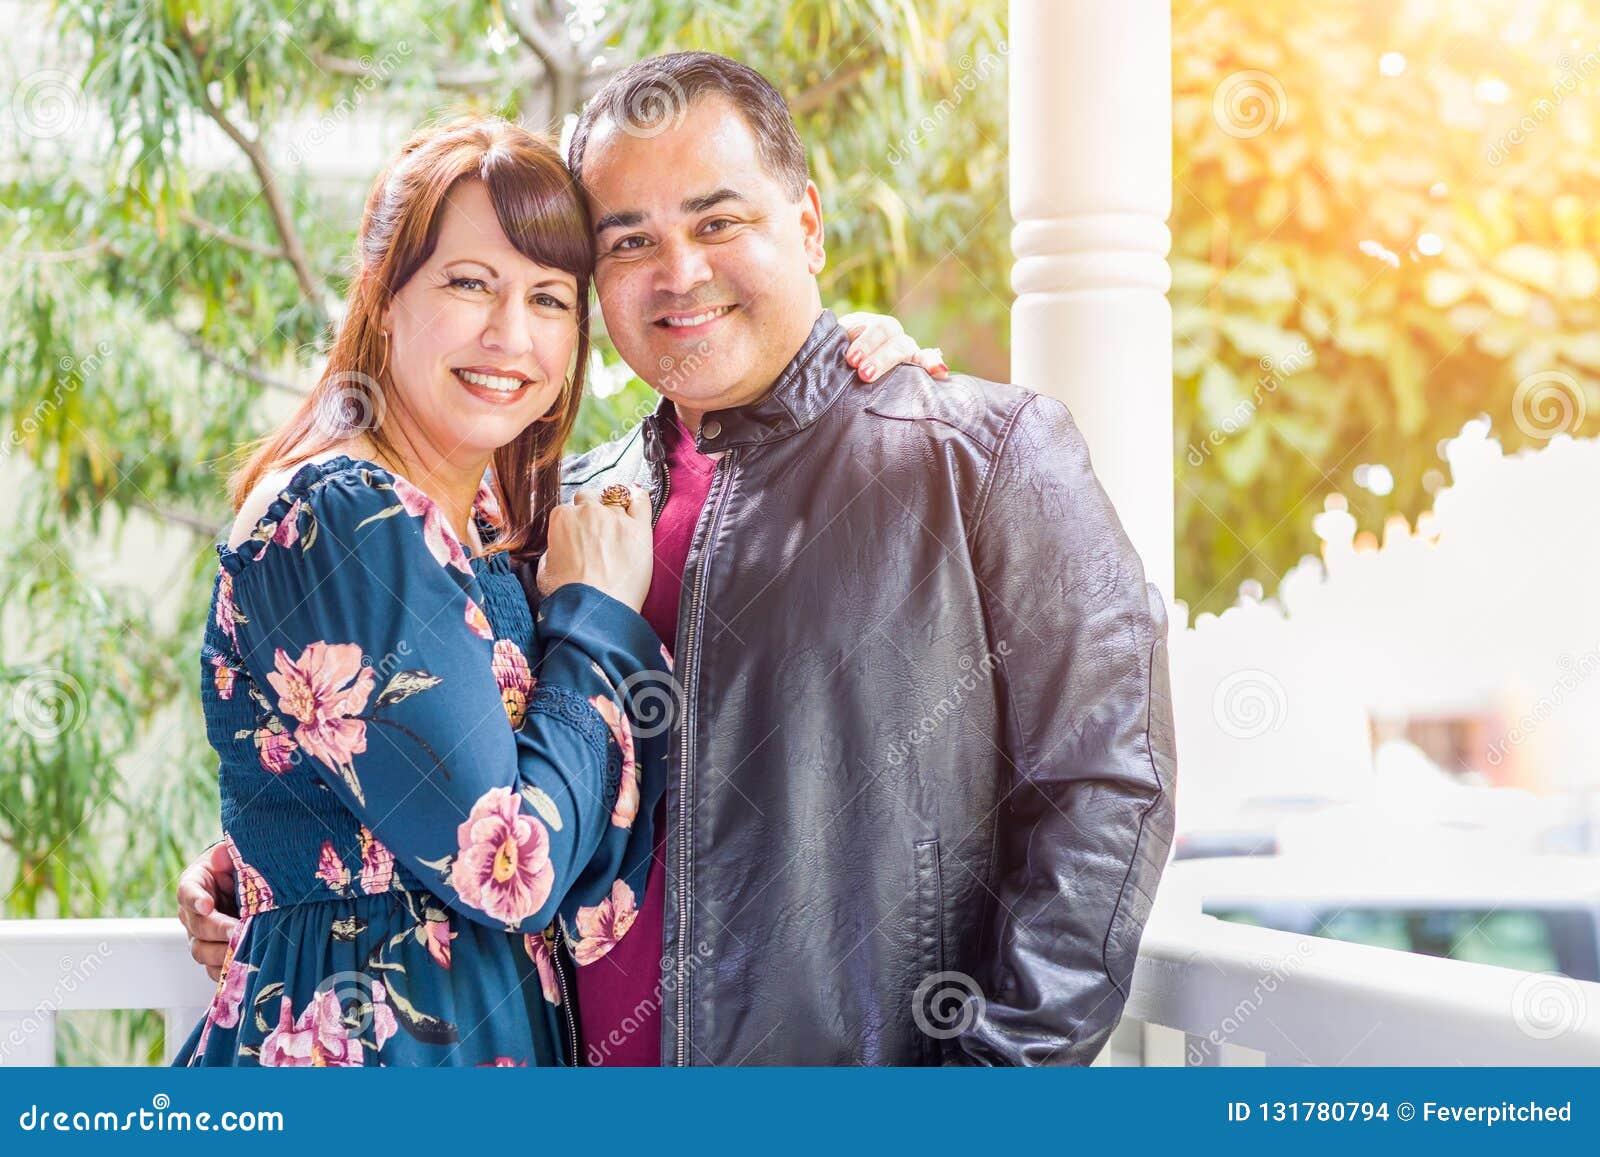 Portrait of Mixed Race Caucasian Woman and Hispanic Man